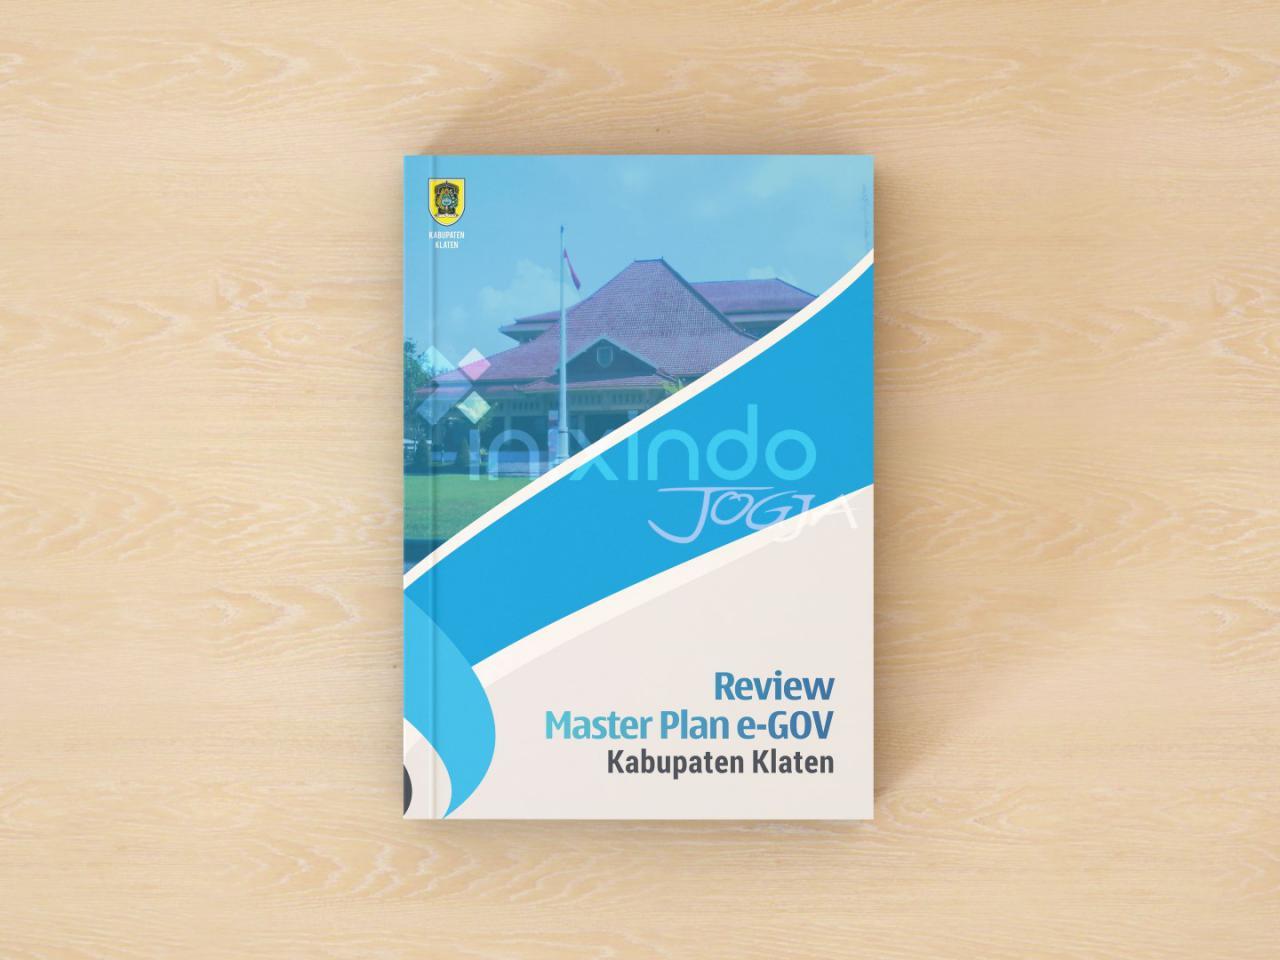 Review Master Plan E-Government Kabupaten Klaten